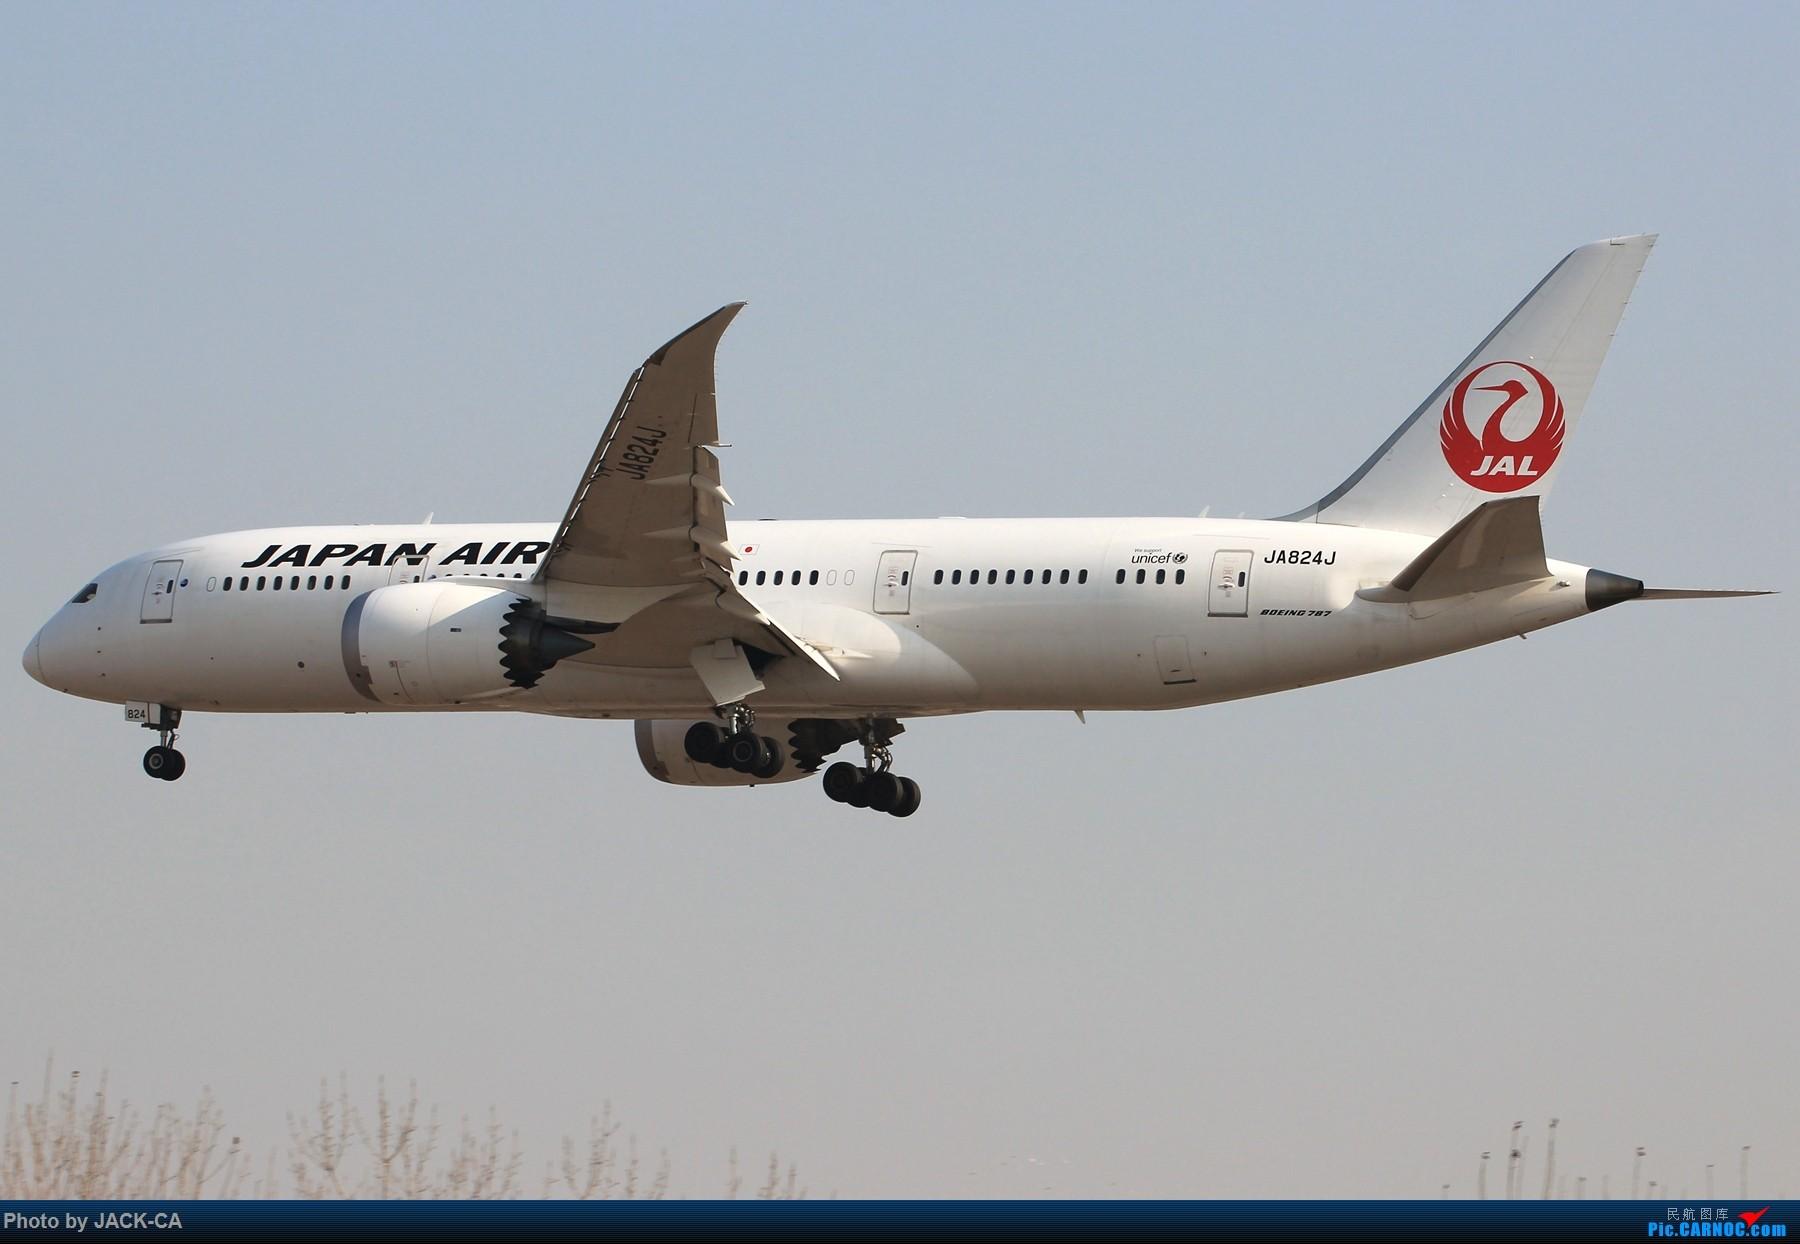 Re:[原创]【组图】盘点在北京通航787的公司都有哪些 1800*1200 BOEING 787-8 JA824J 中国北京首都国际机场